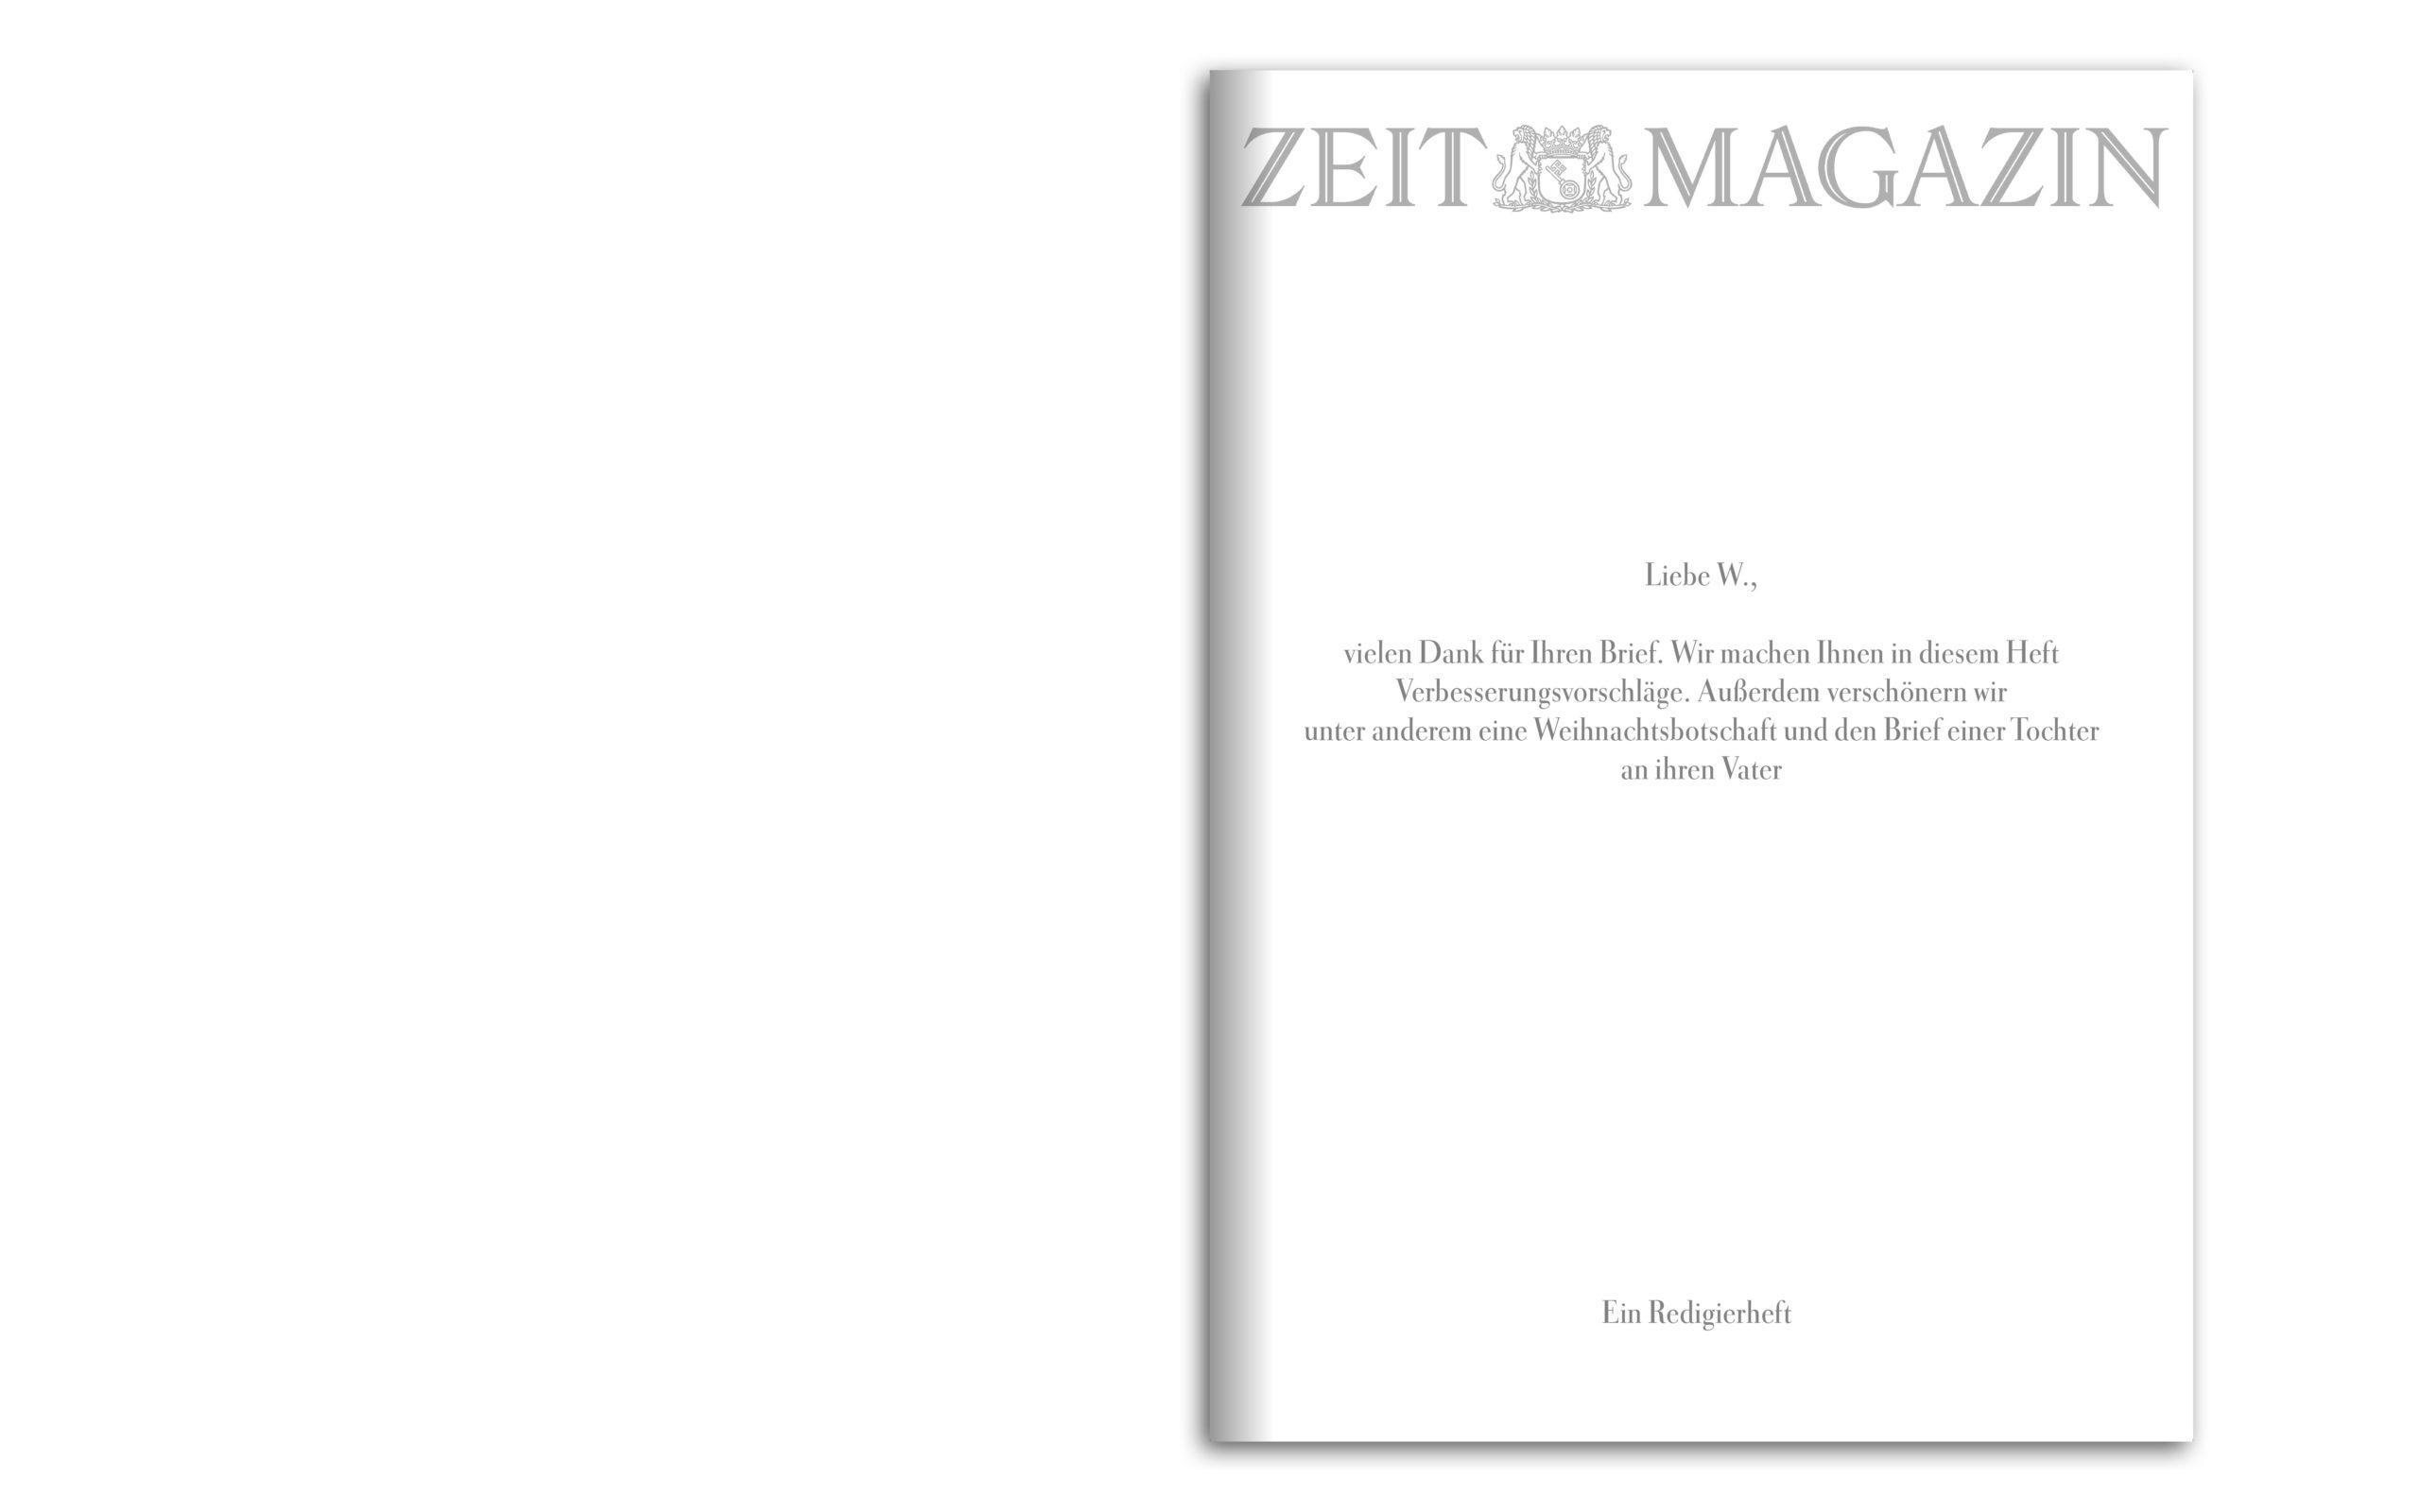 ZeitMagazin8